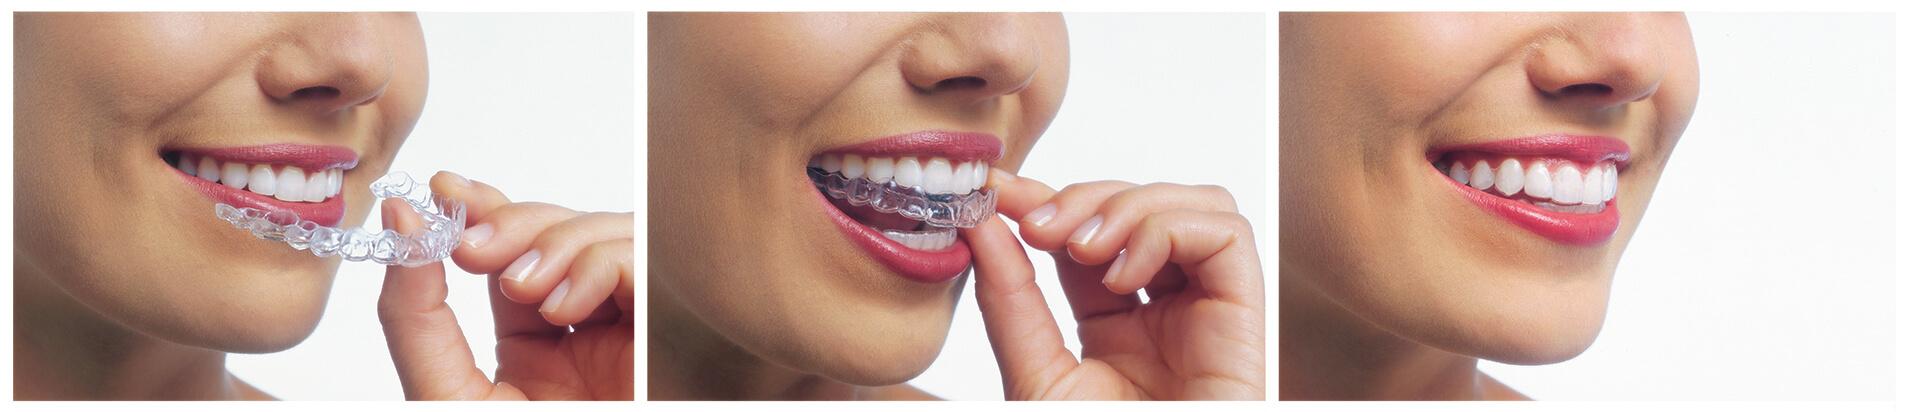 Invisalign Provider Yamamoto & Lee Family Dentistry, Roseville CA